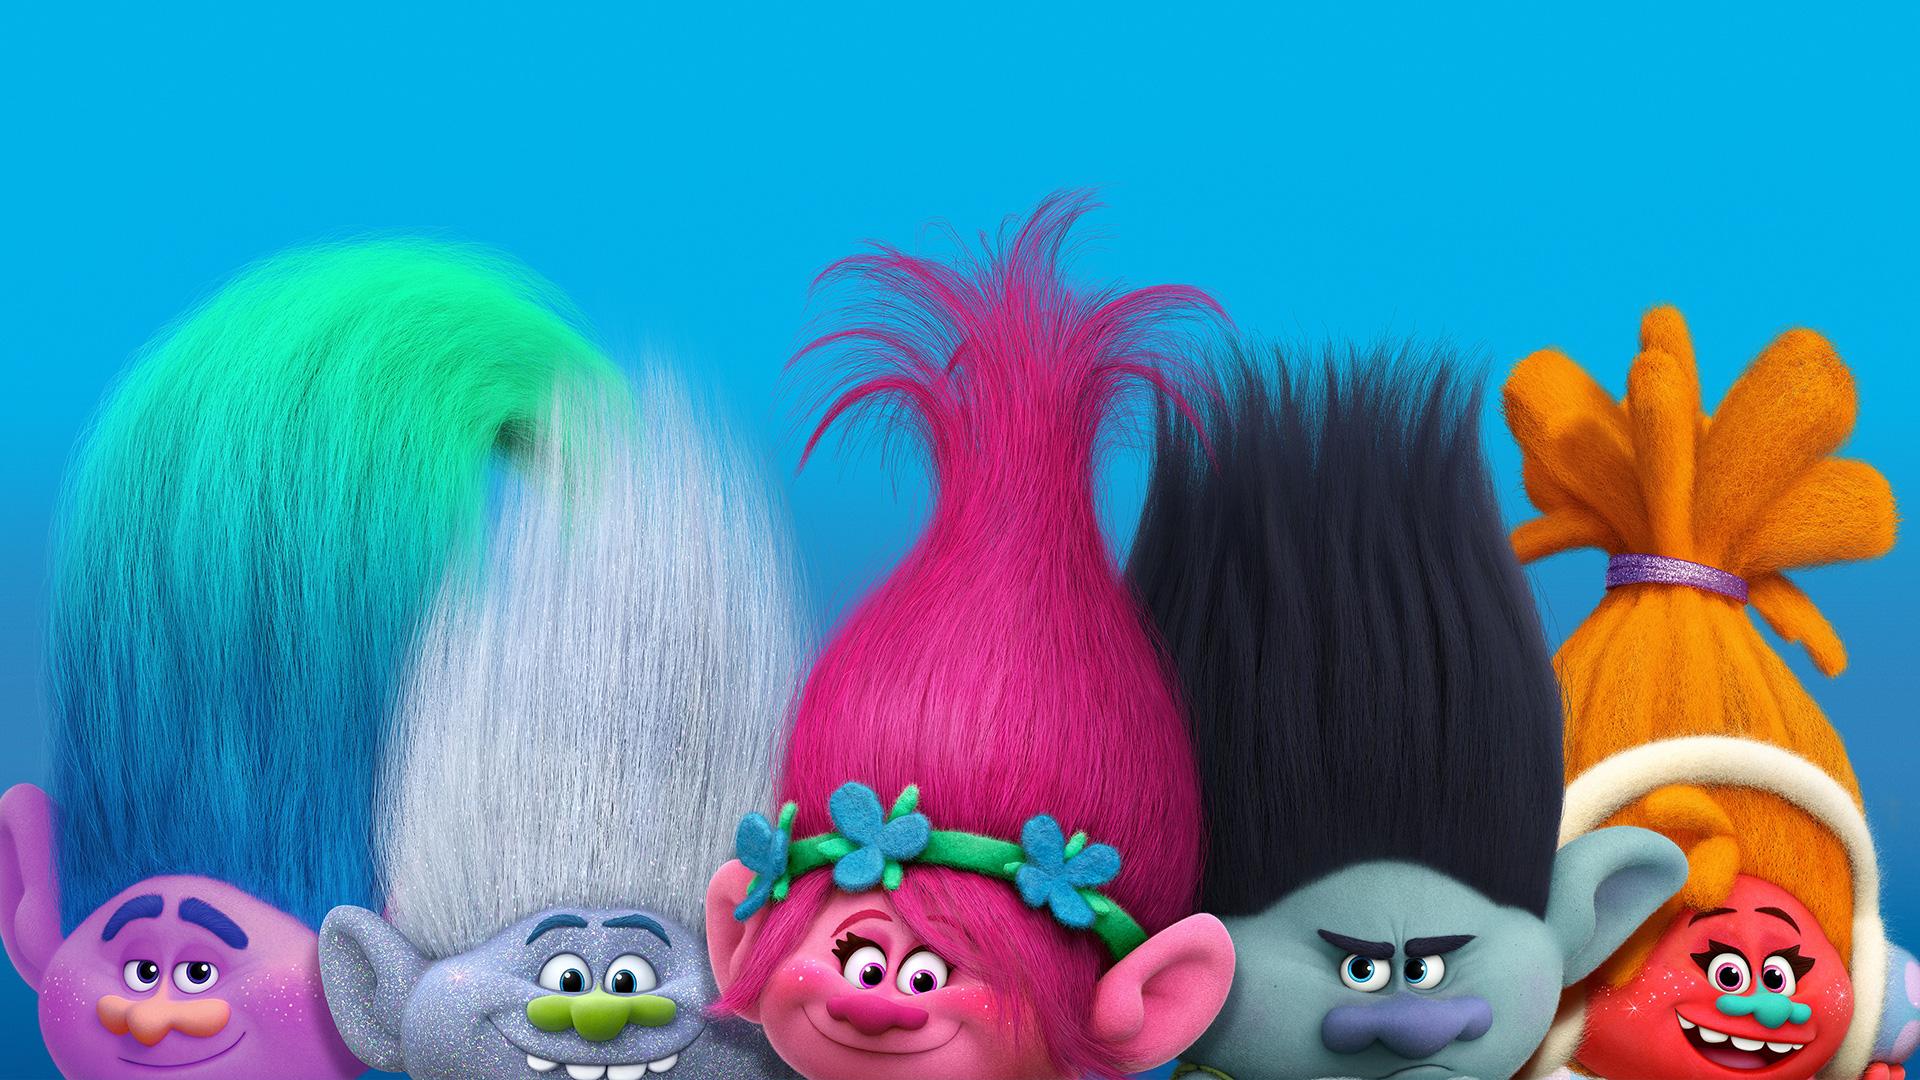 Trolls Movie Fanart Fanart Tv HD Wallpapers Download Free Images Wallpaper [1000image.com]